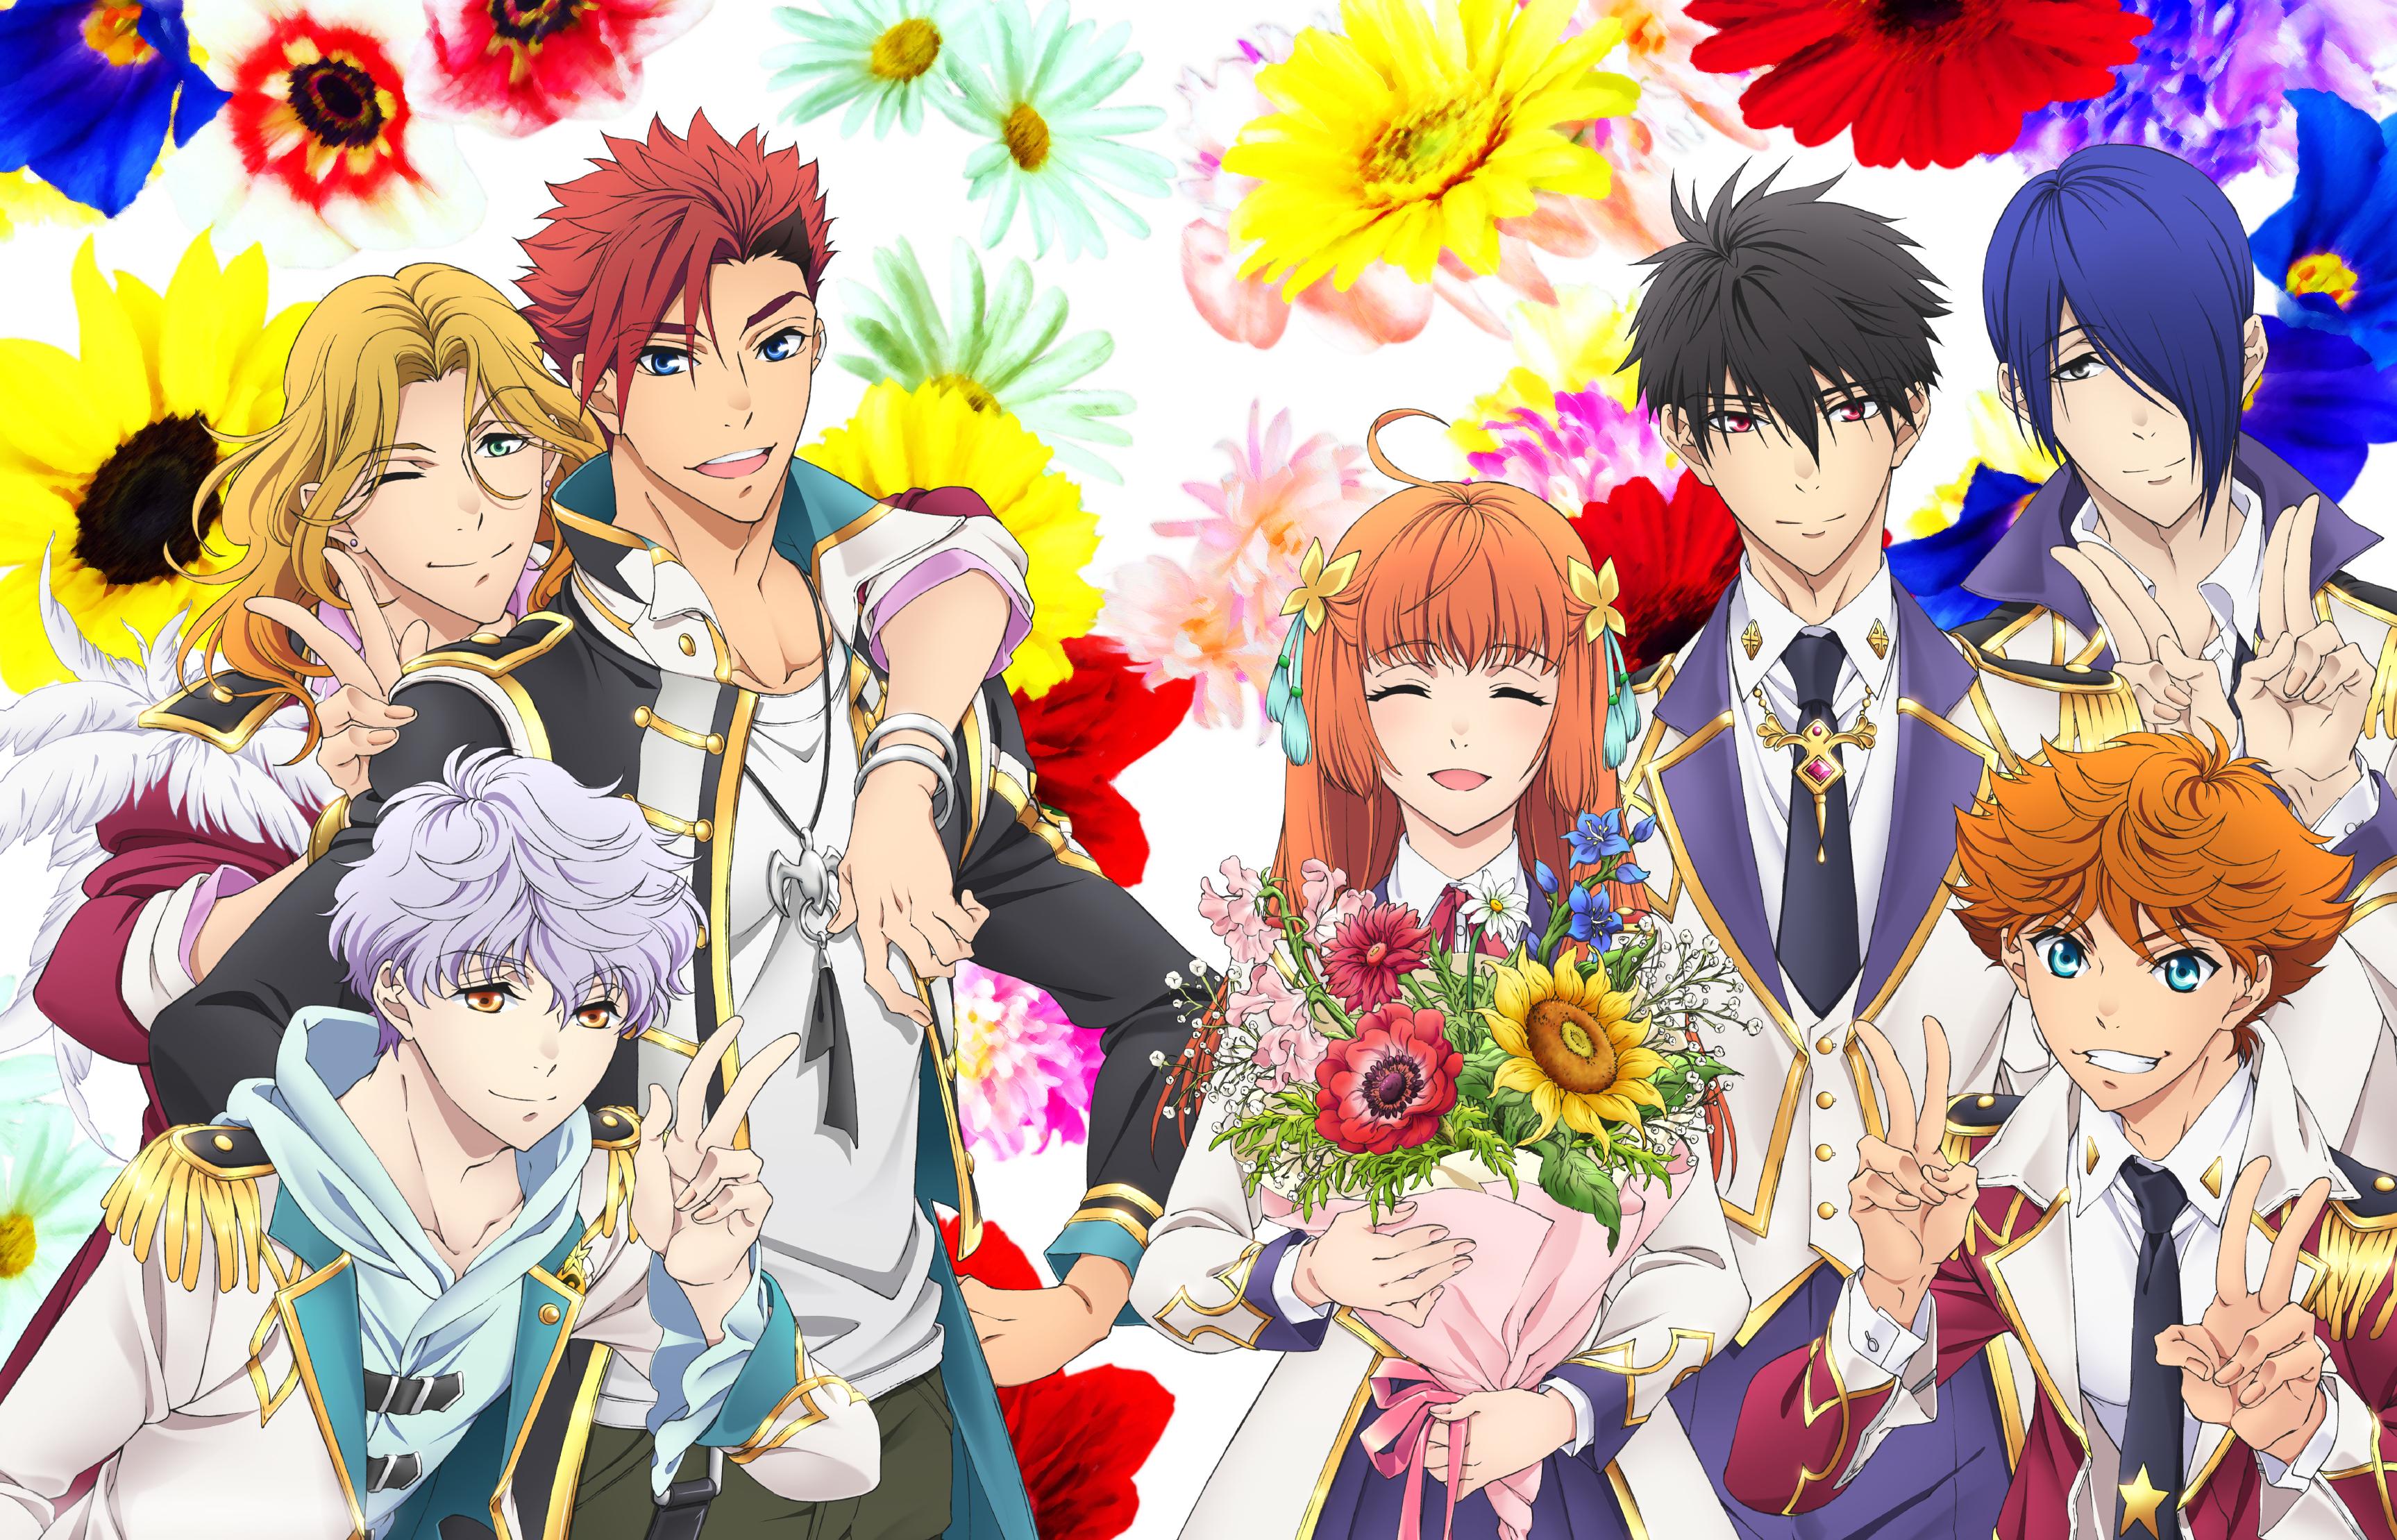 Magic-kyun! Renaissance Image #2945030 - Zerochan Anime Image Board